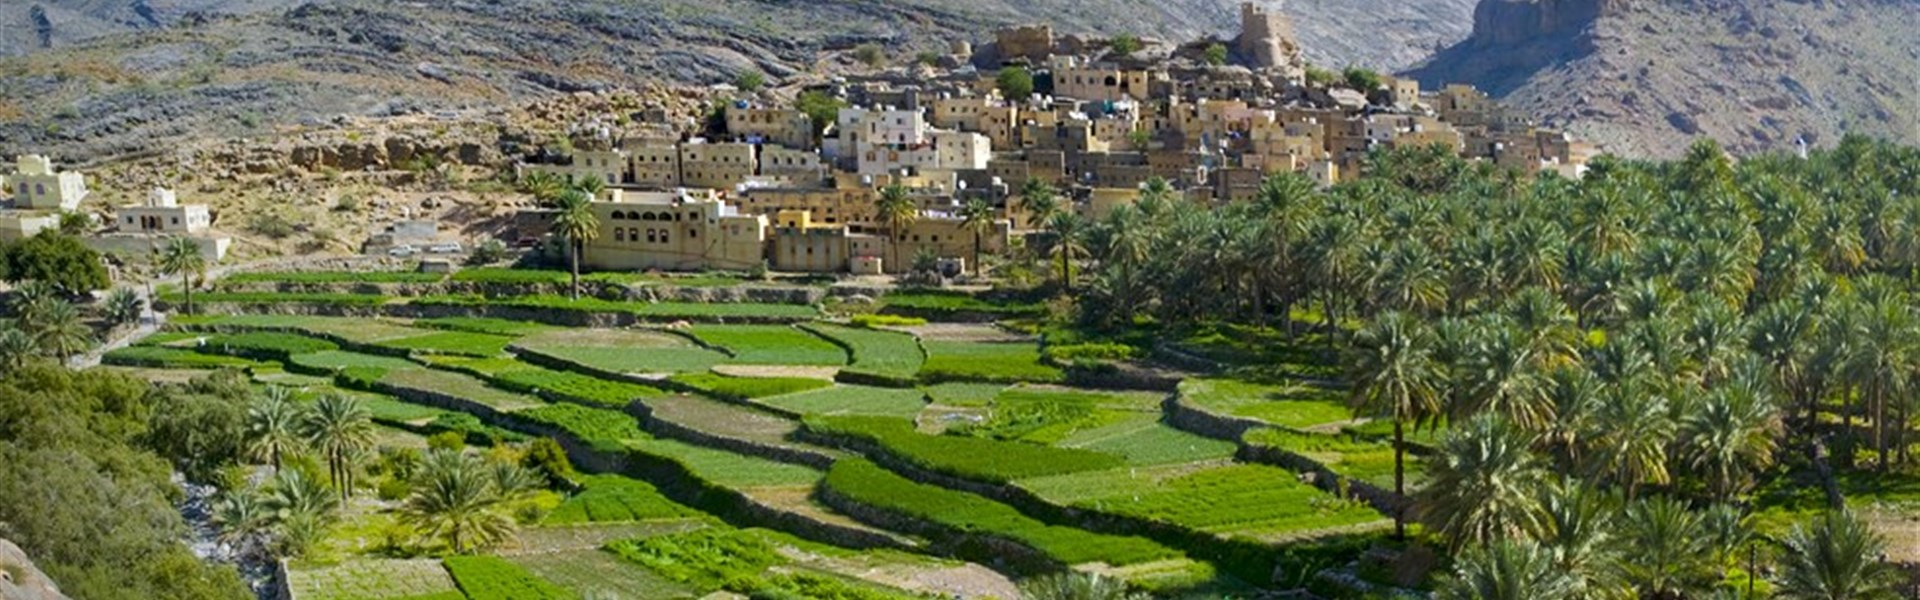 Self drive Ománem s pobytem u moře - Oáza pod horami Jabal Akhdar